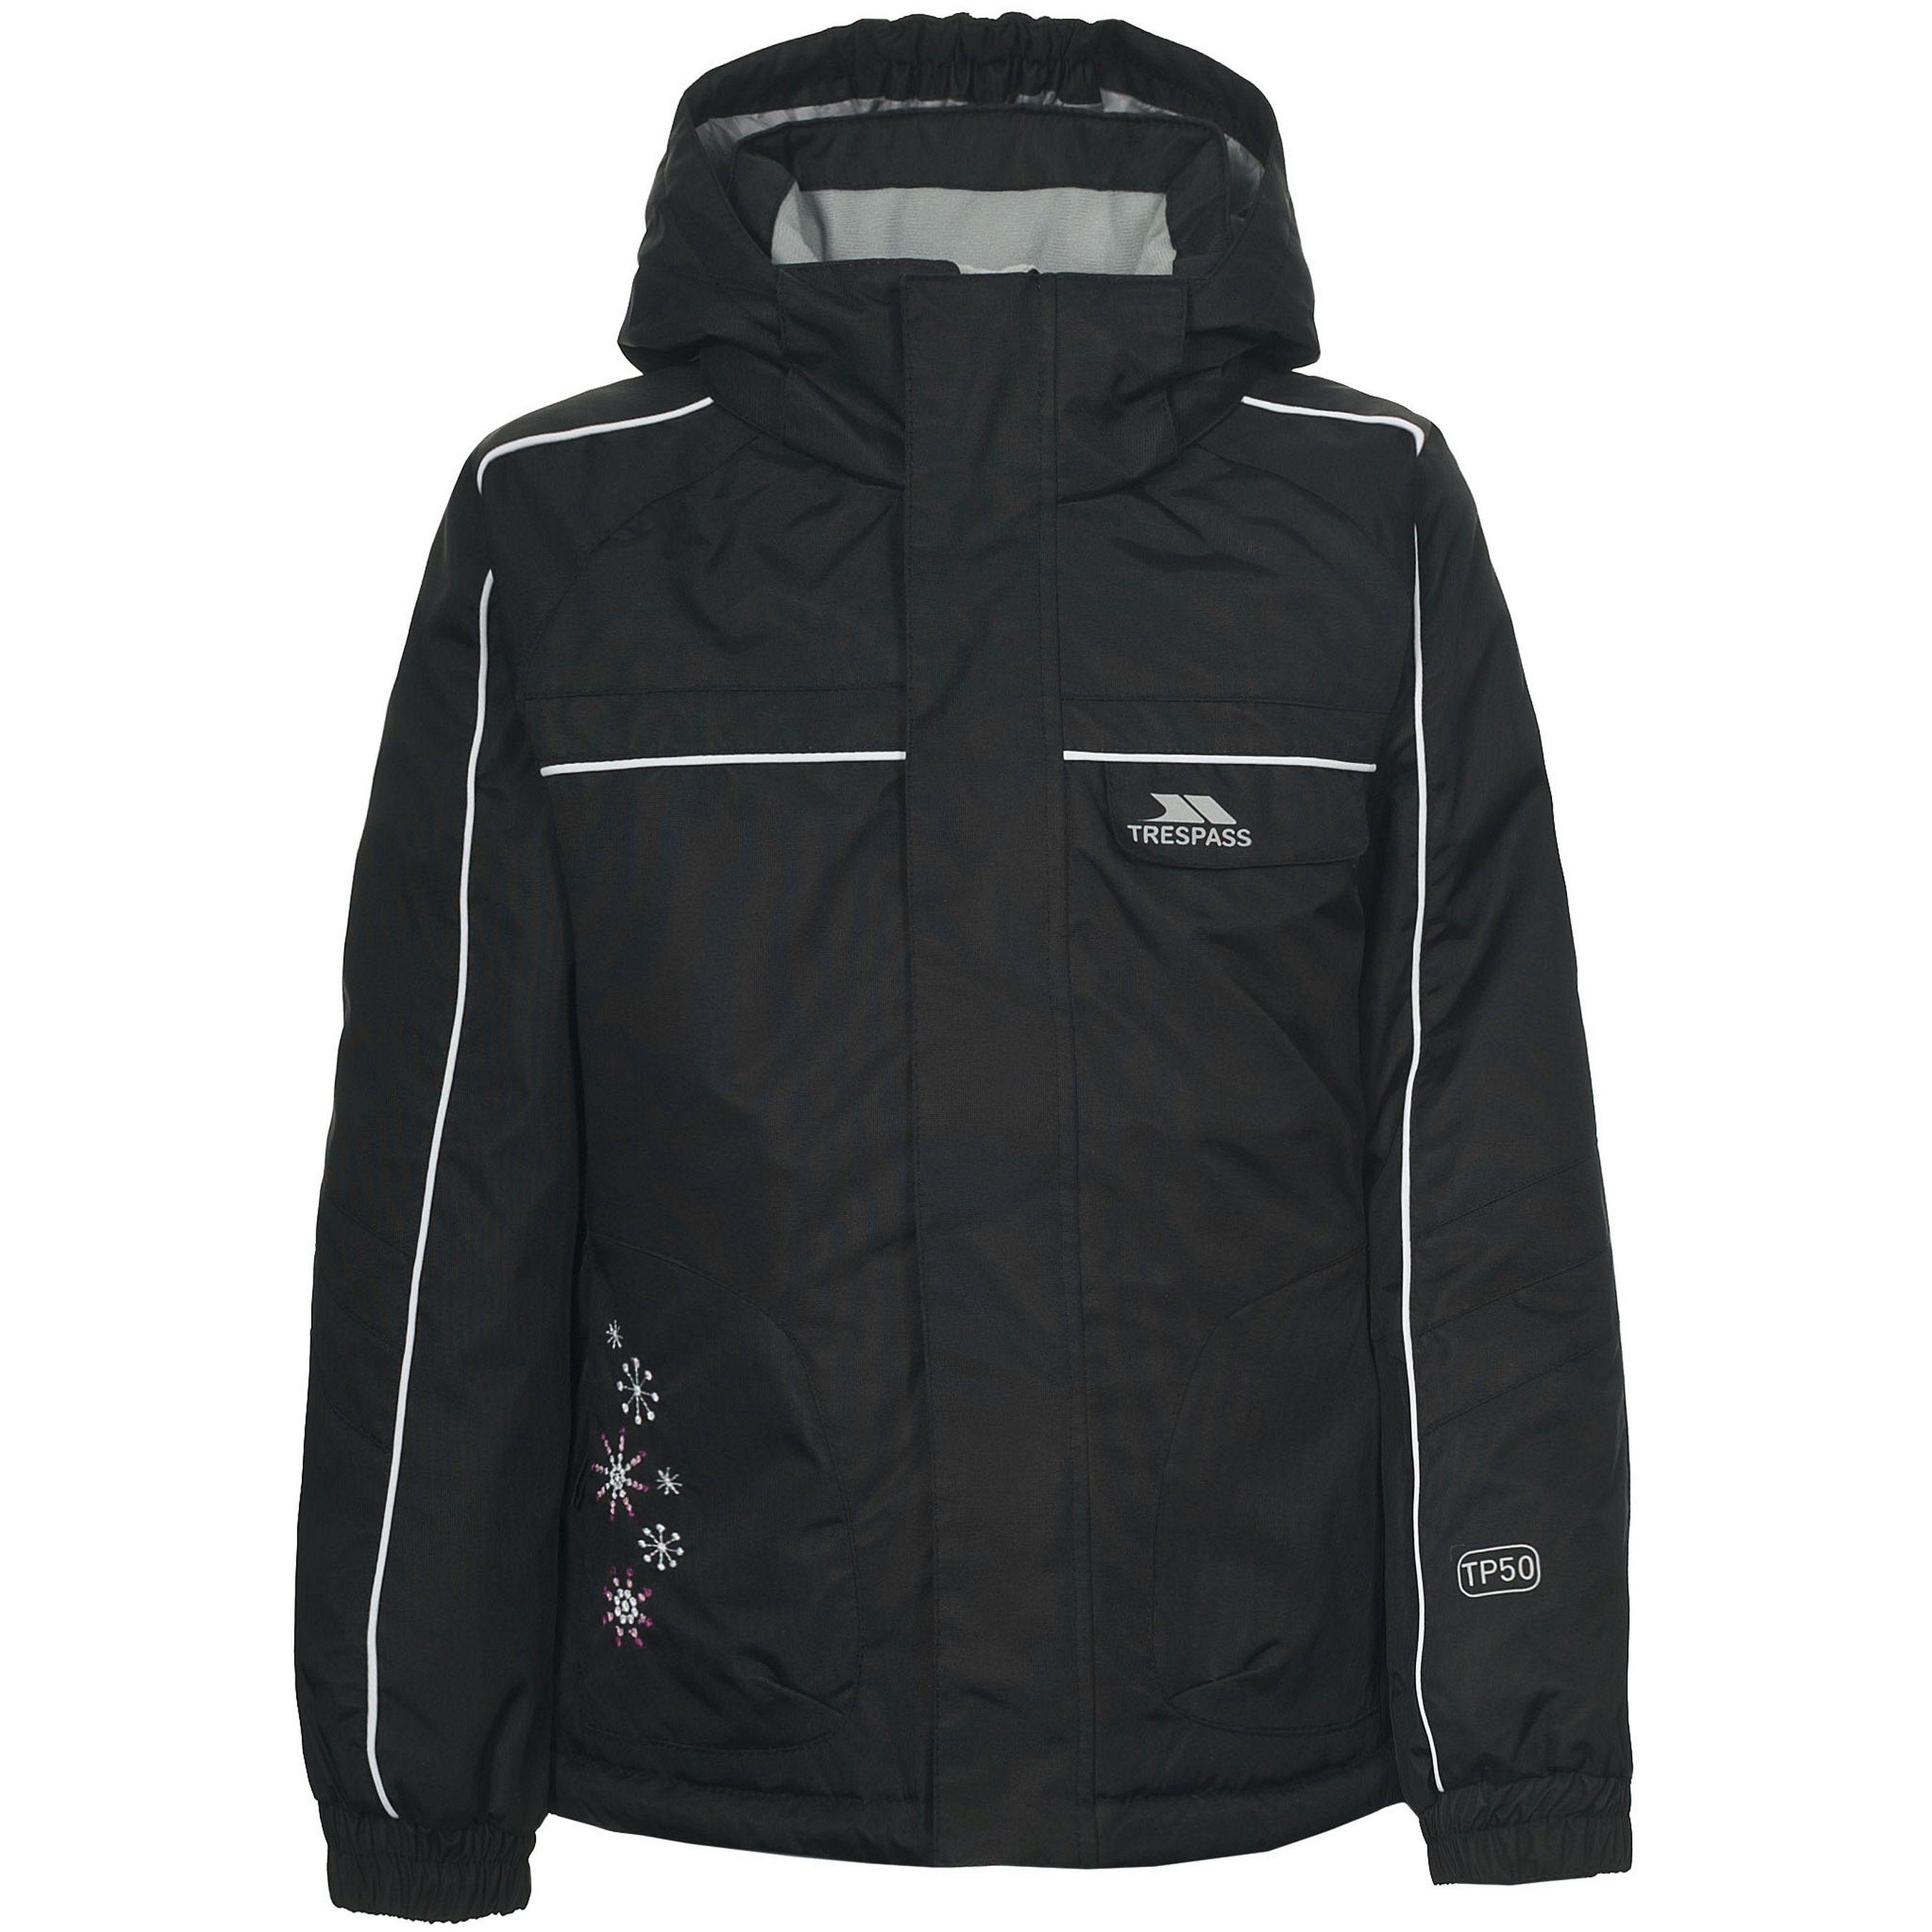 Trespass Childrens Girls Jaya Water Resistant Ski Jacket (Black)